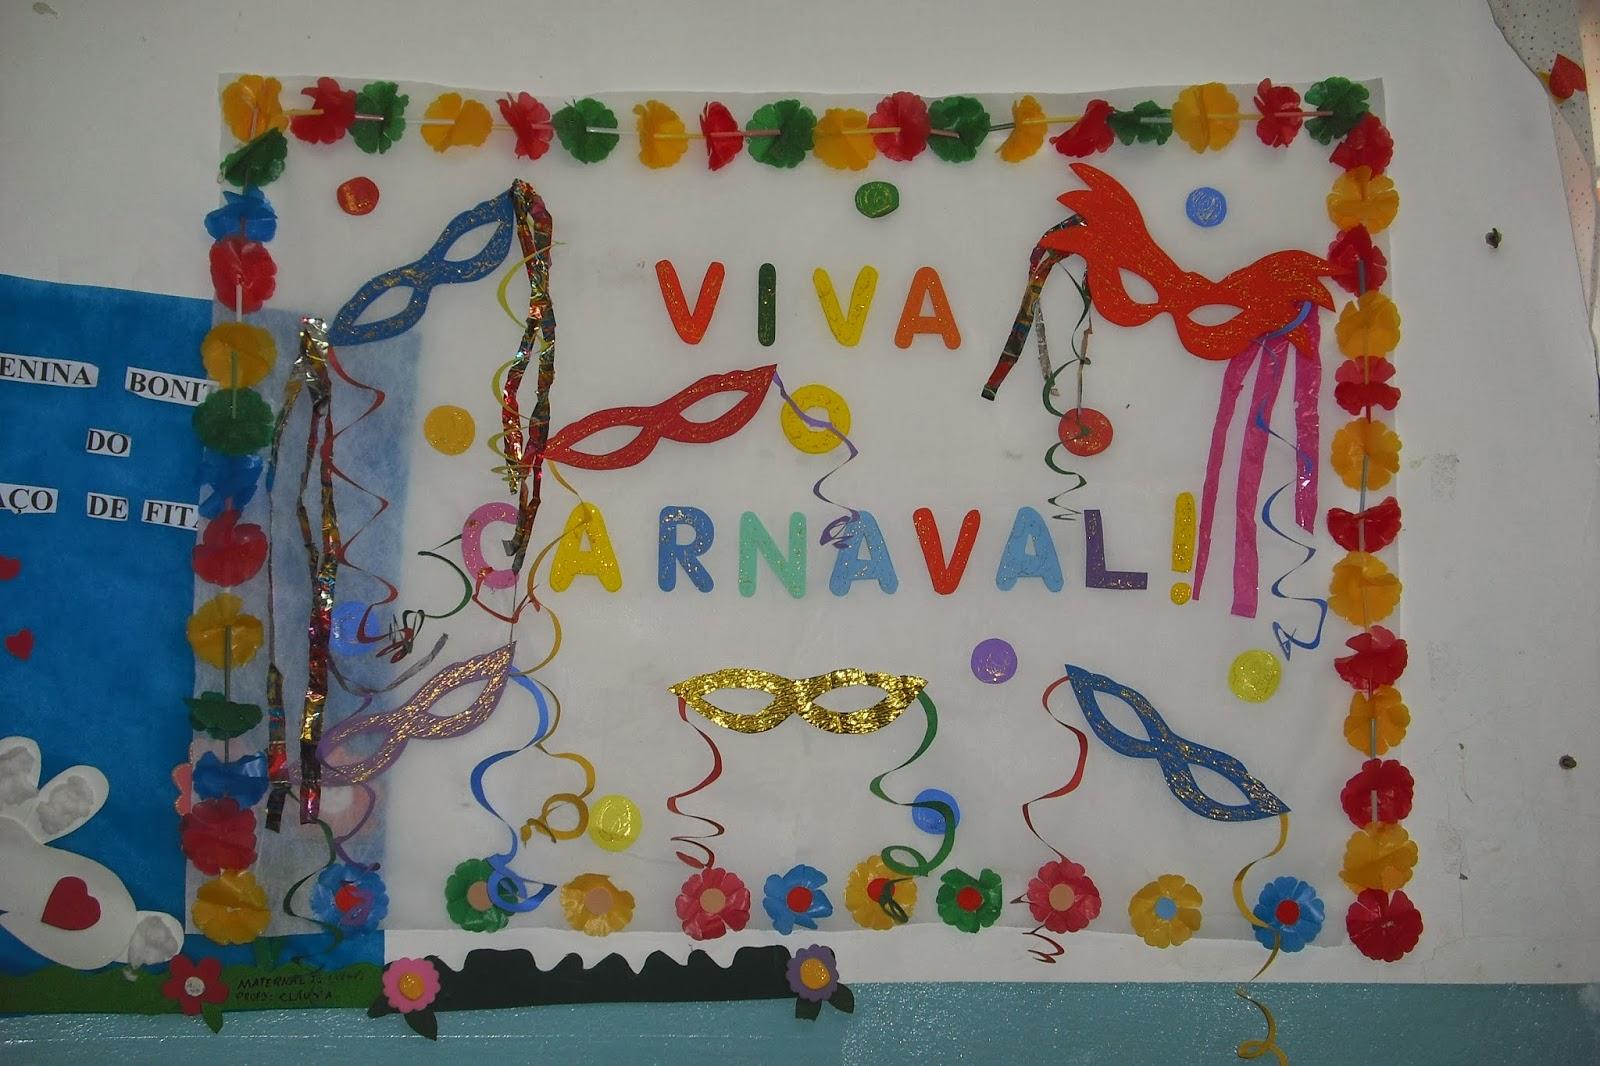 Canal pedag gico painel carnaval for Mural de fotos 1 ano